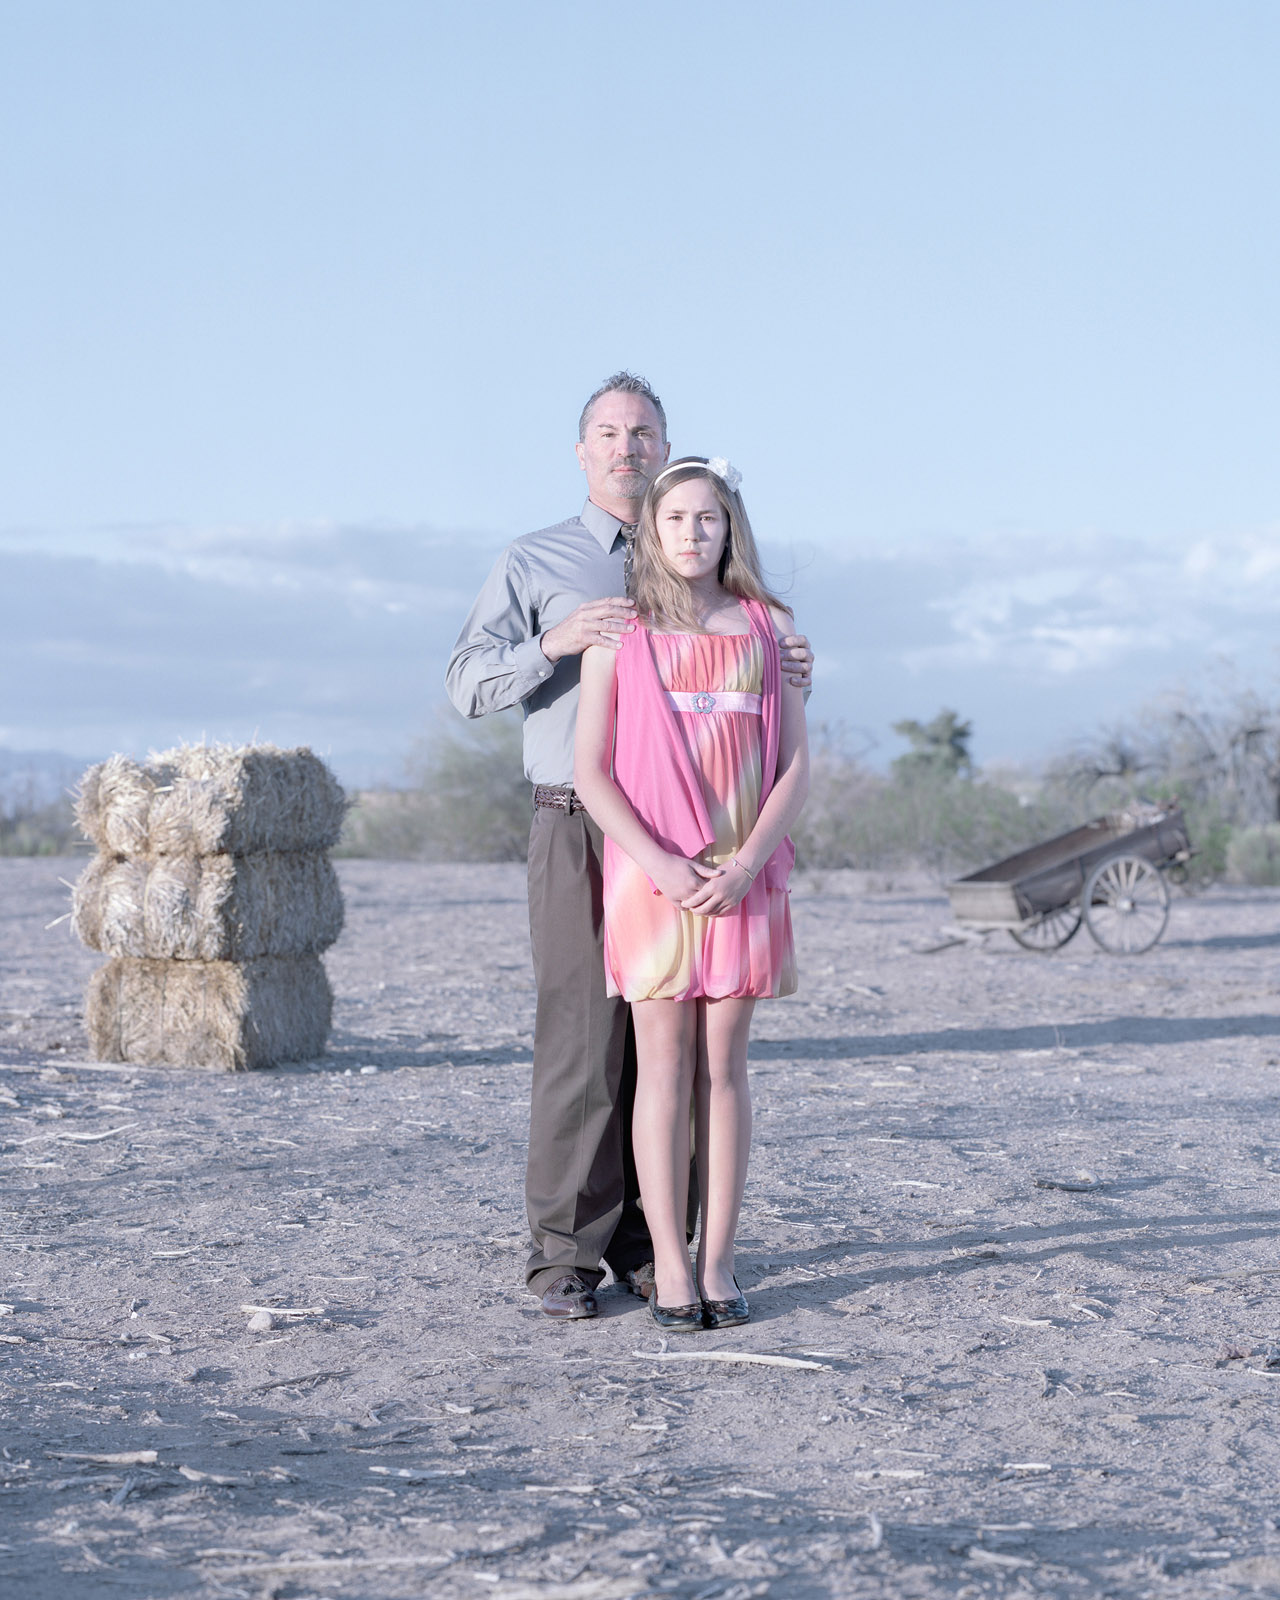 Tom & Calee Cortes, Surprise, Arizona